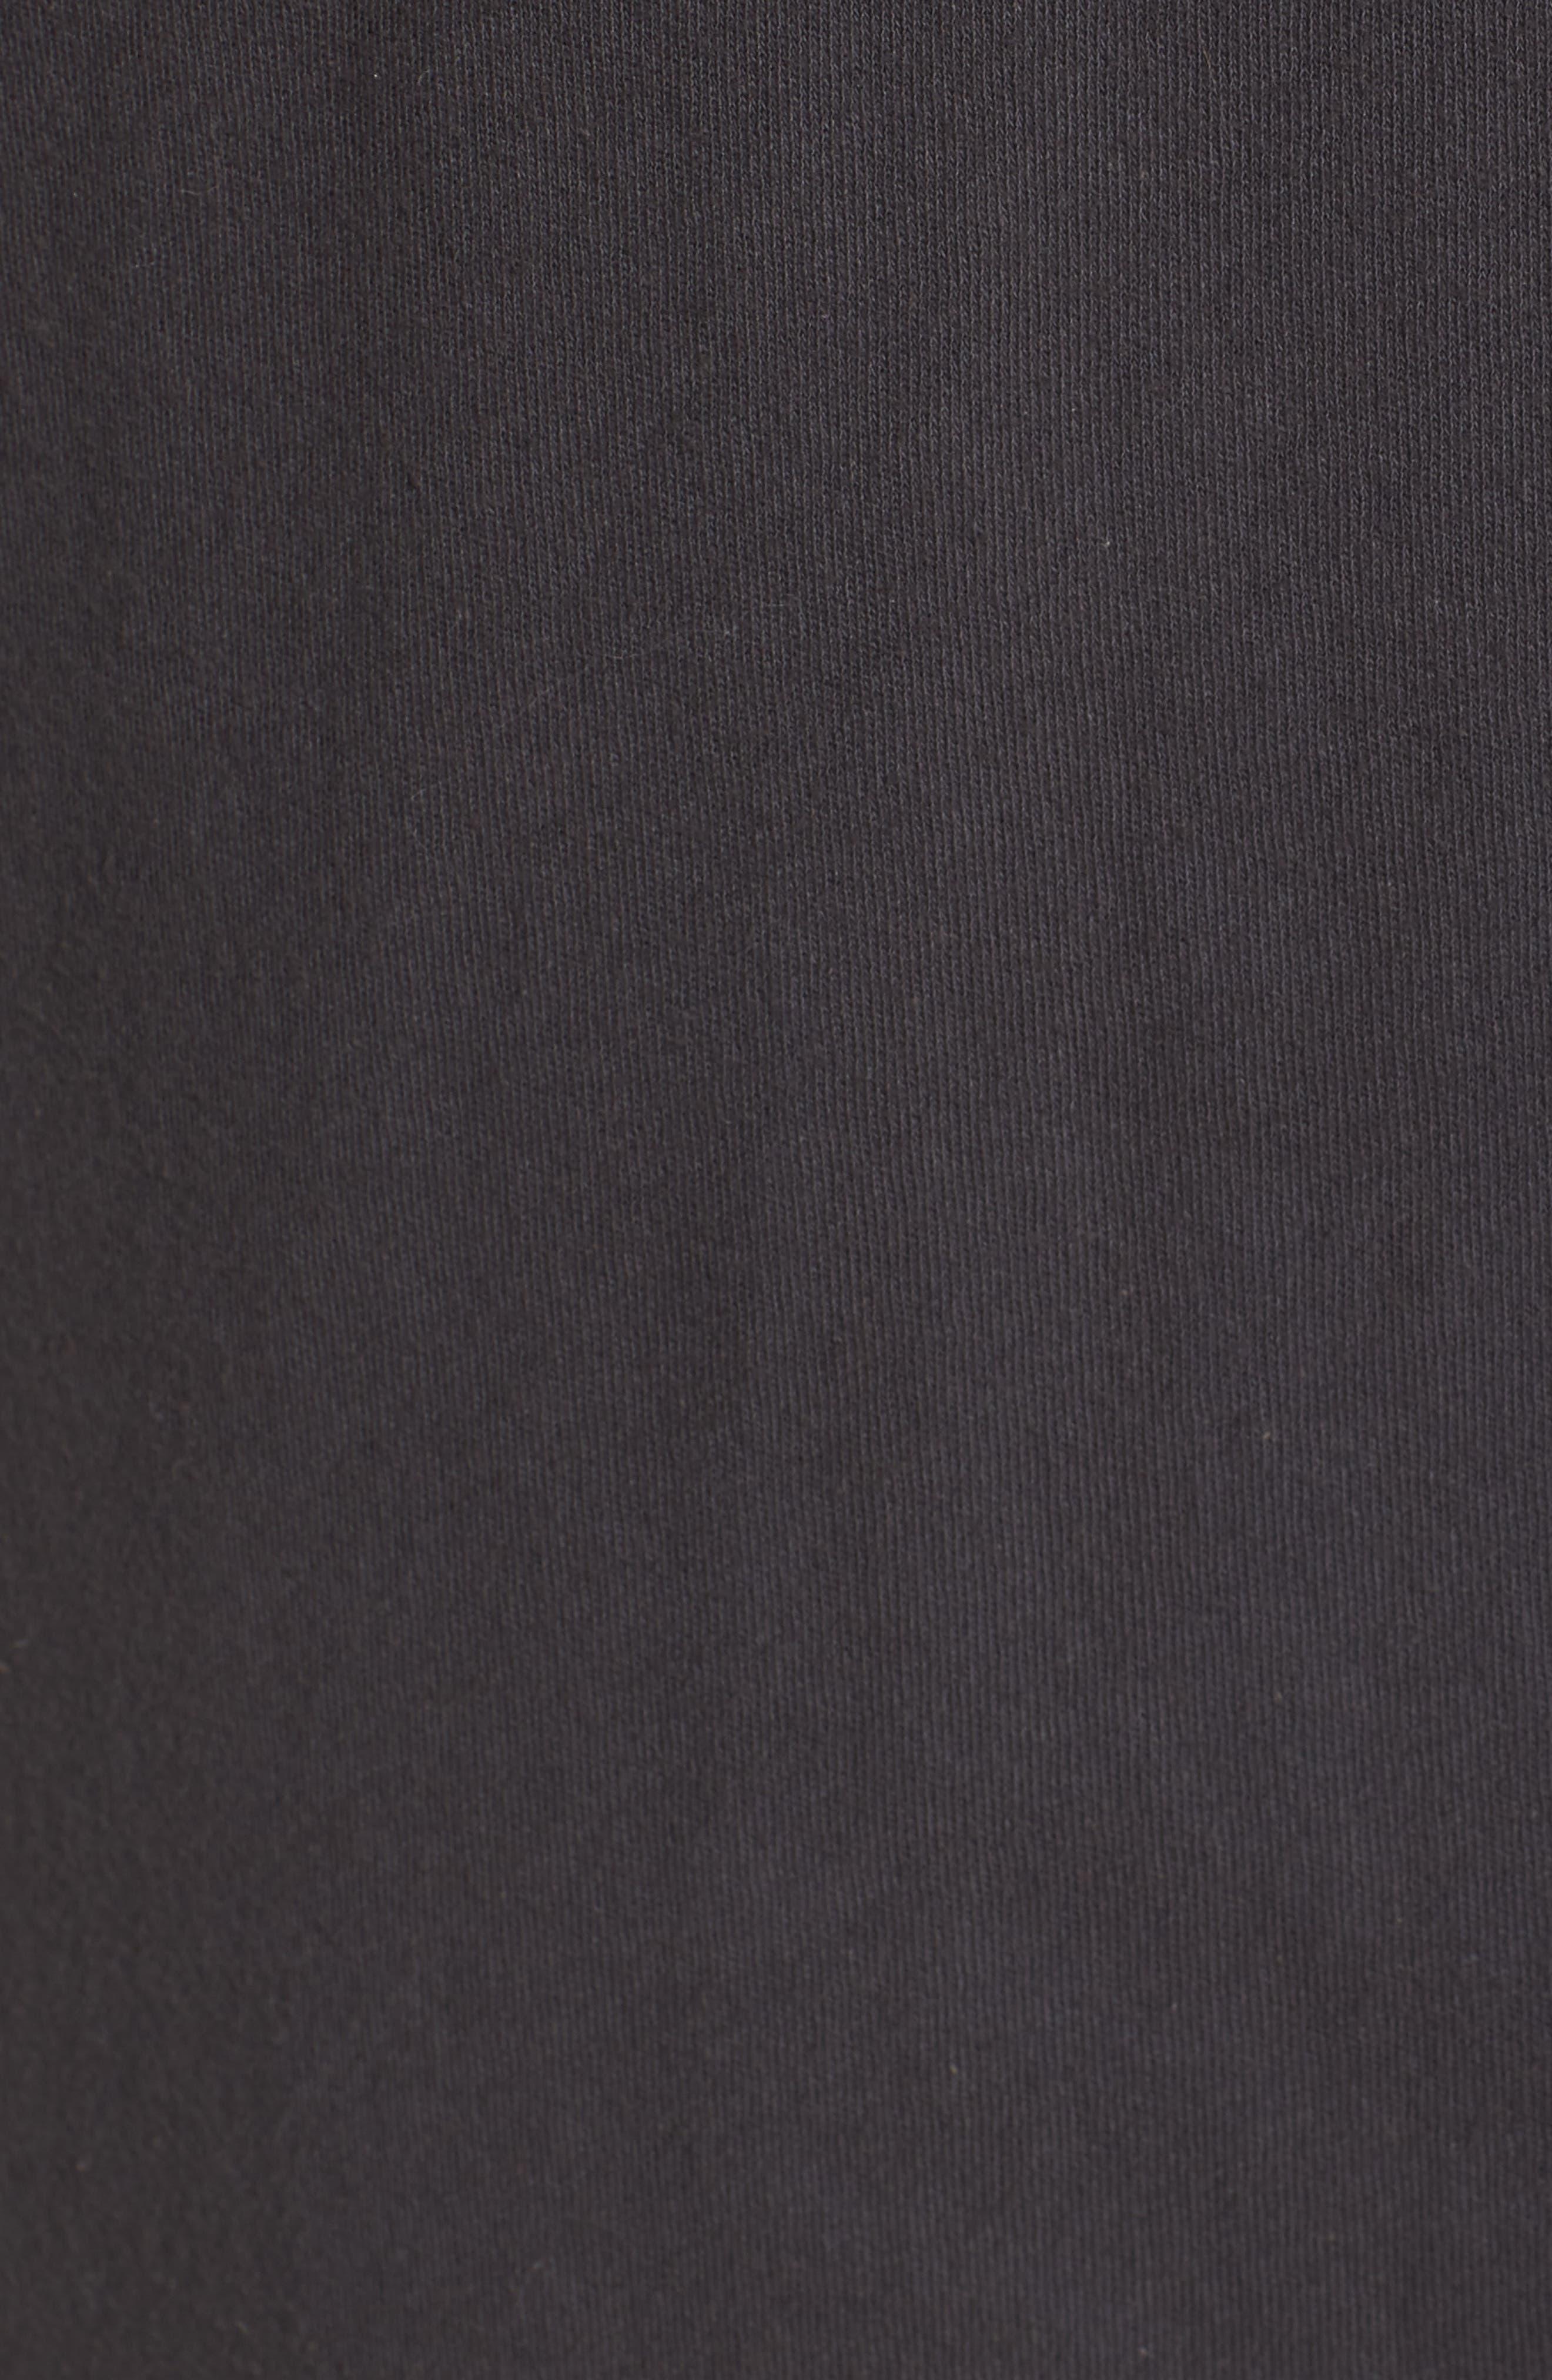 Hoodie Cardigan,                             Alternate thumbnail 6, color,                             020